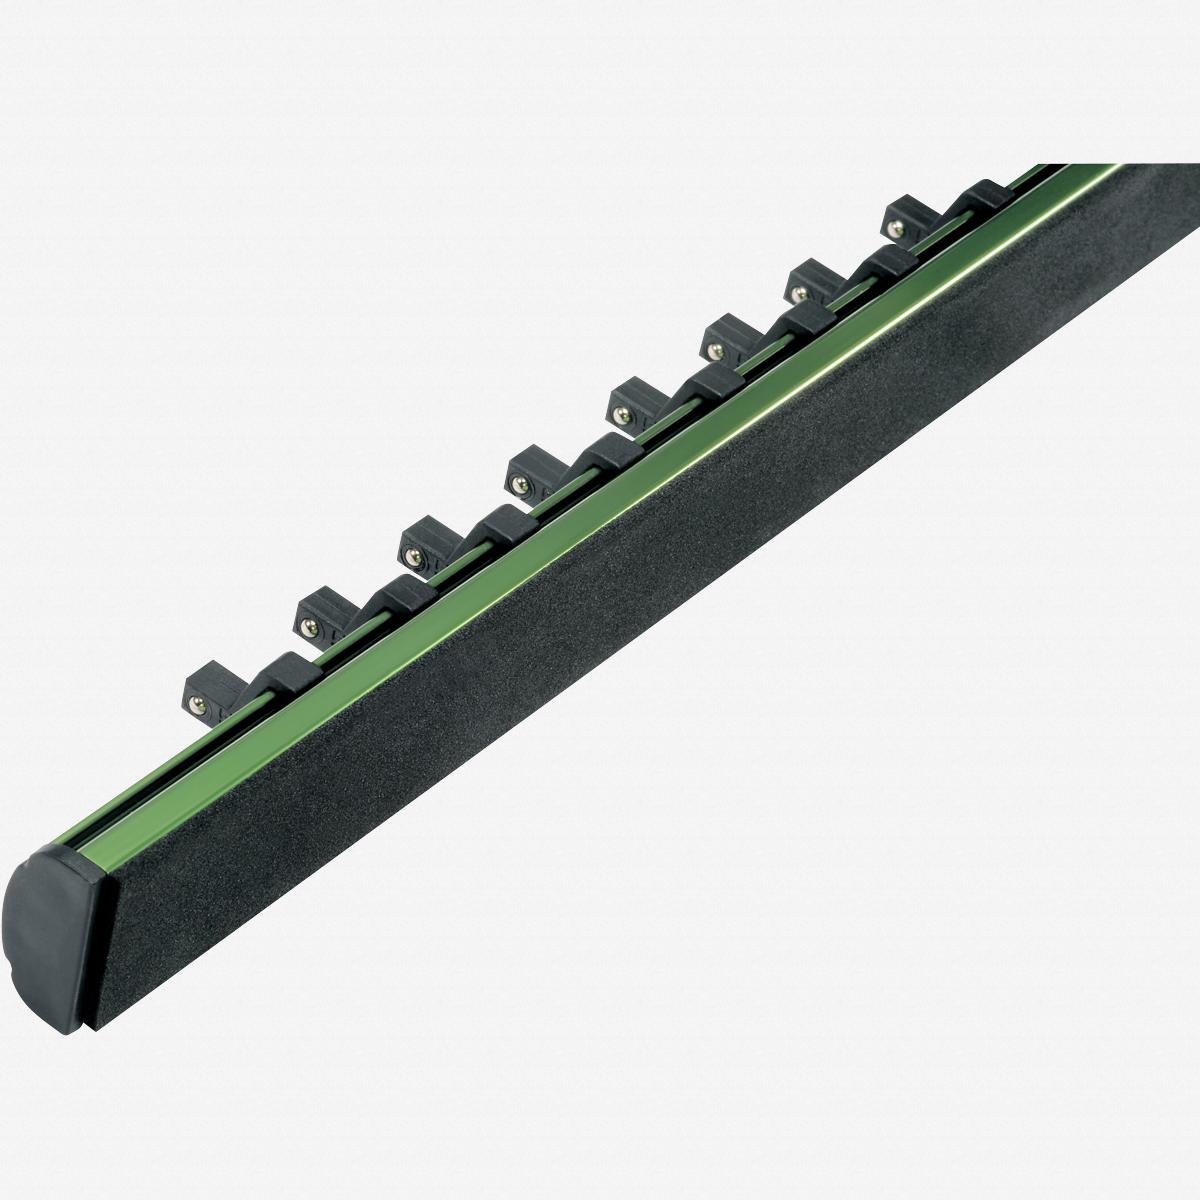 "Heyco 0257000 Metric Socket Set on Aluminum Rail - 1/4"" Drive, 13 Pieces - KC Tool"